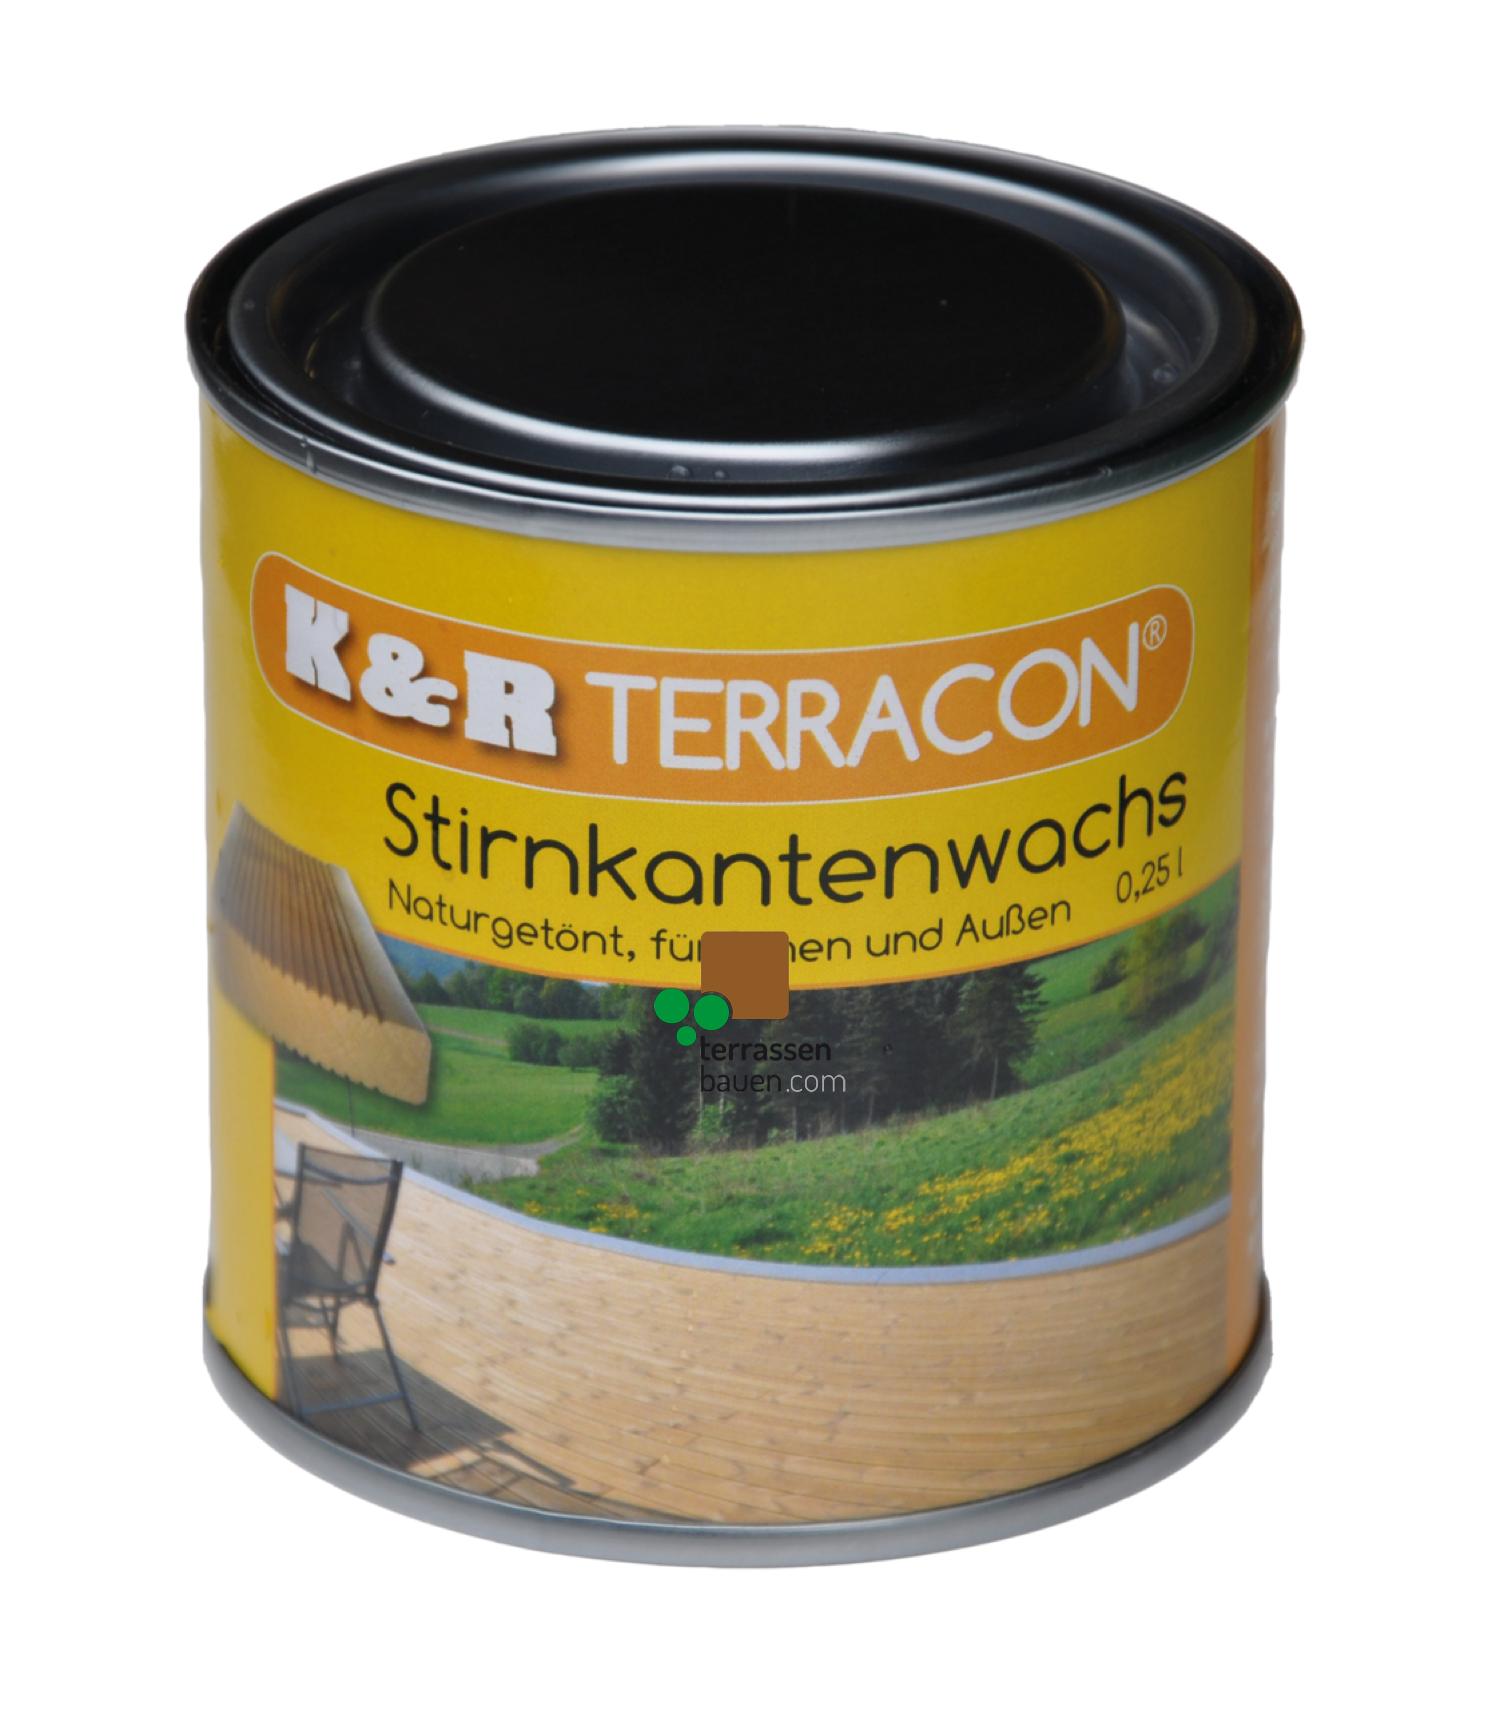 K&R Stirnkantenwachs, 250ml Dose